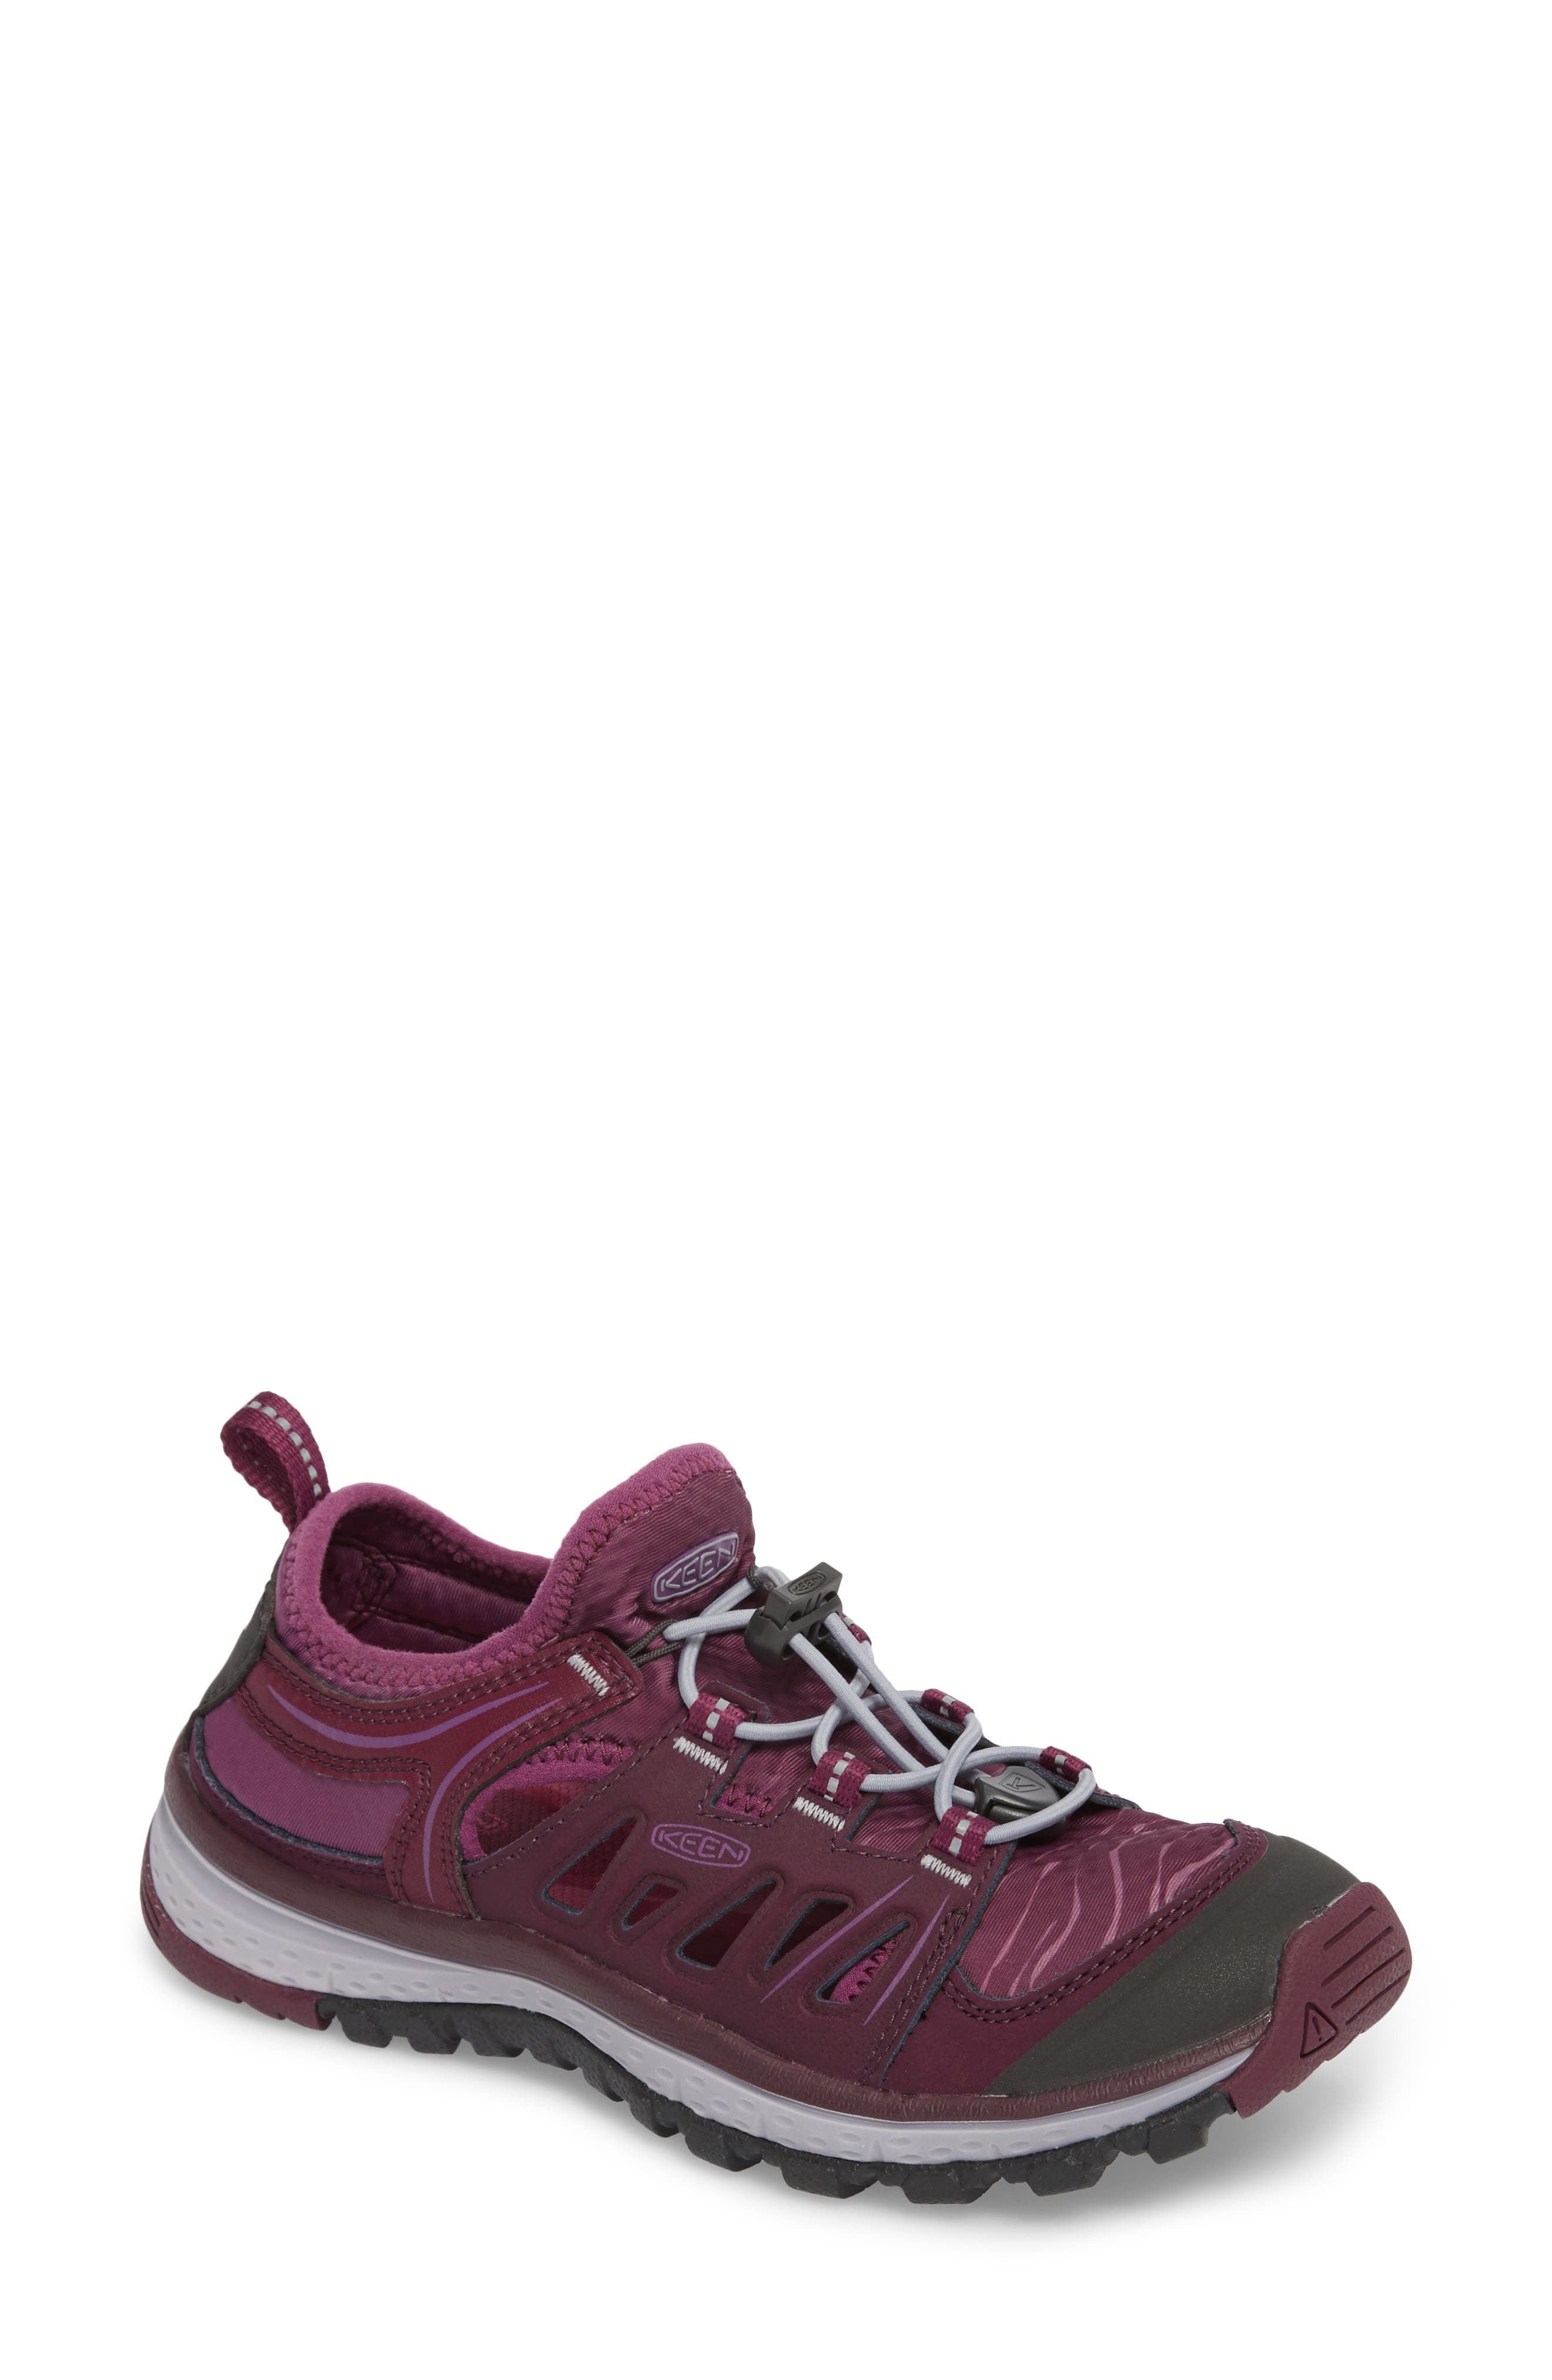 Terradora Ethos Hiking Sneaker,                             Main thumbnail 1, color,                             Grape Wine/ Grape Kiss